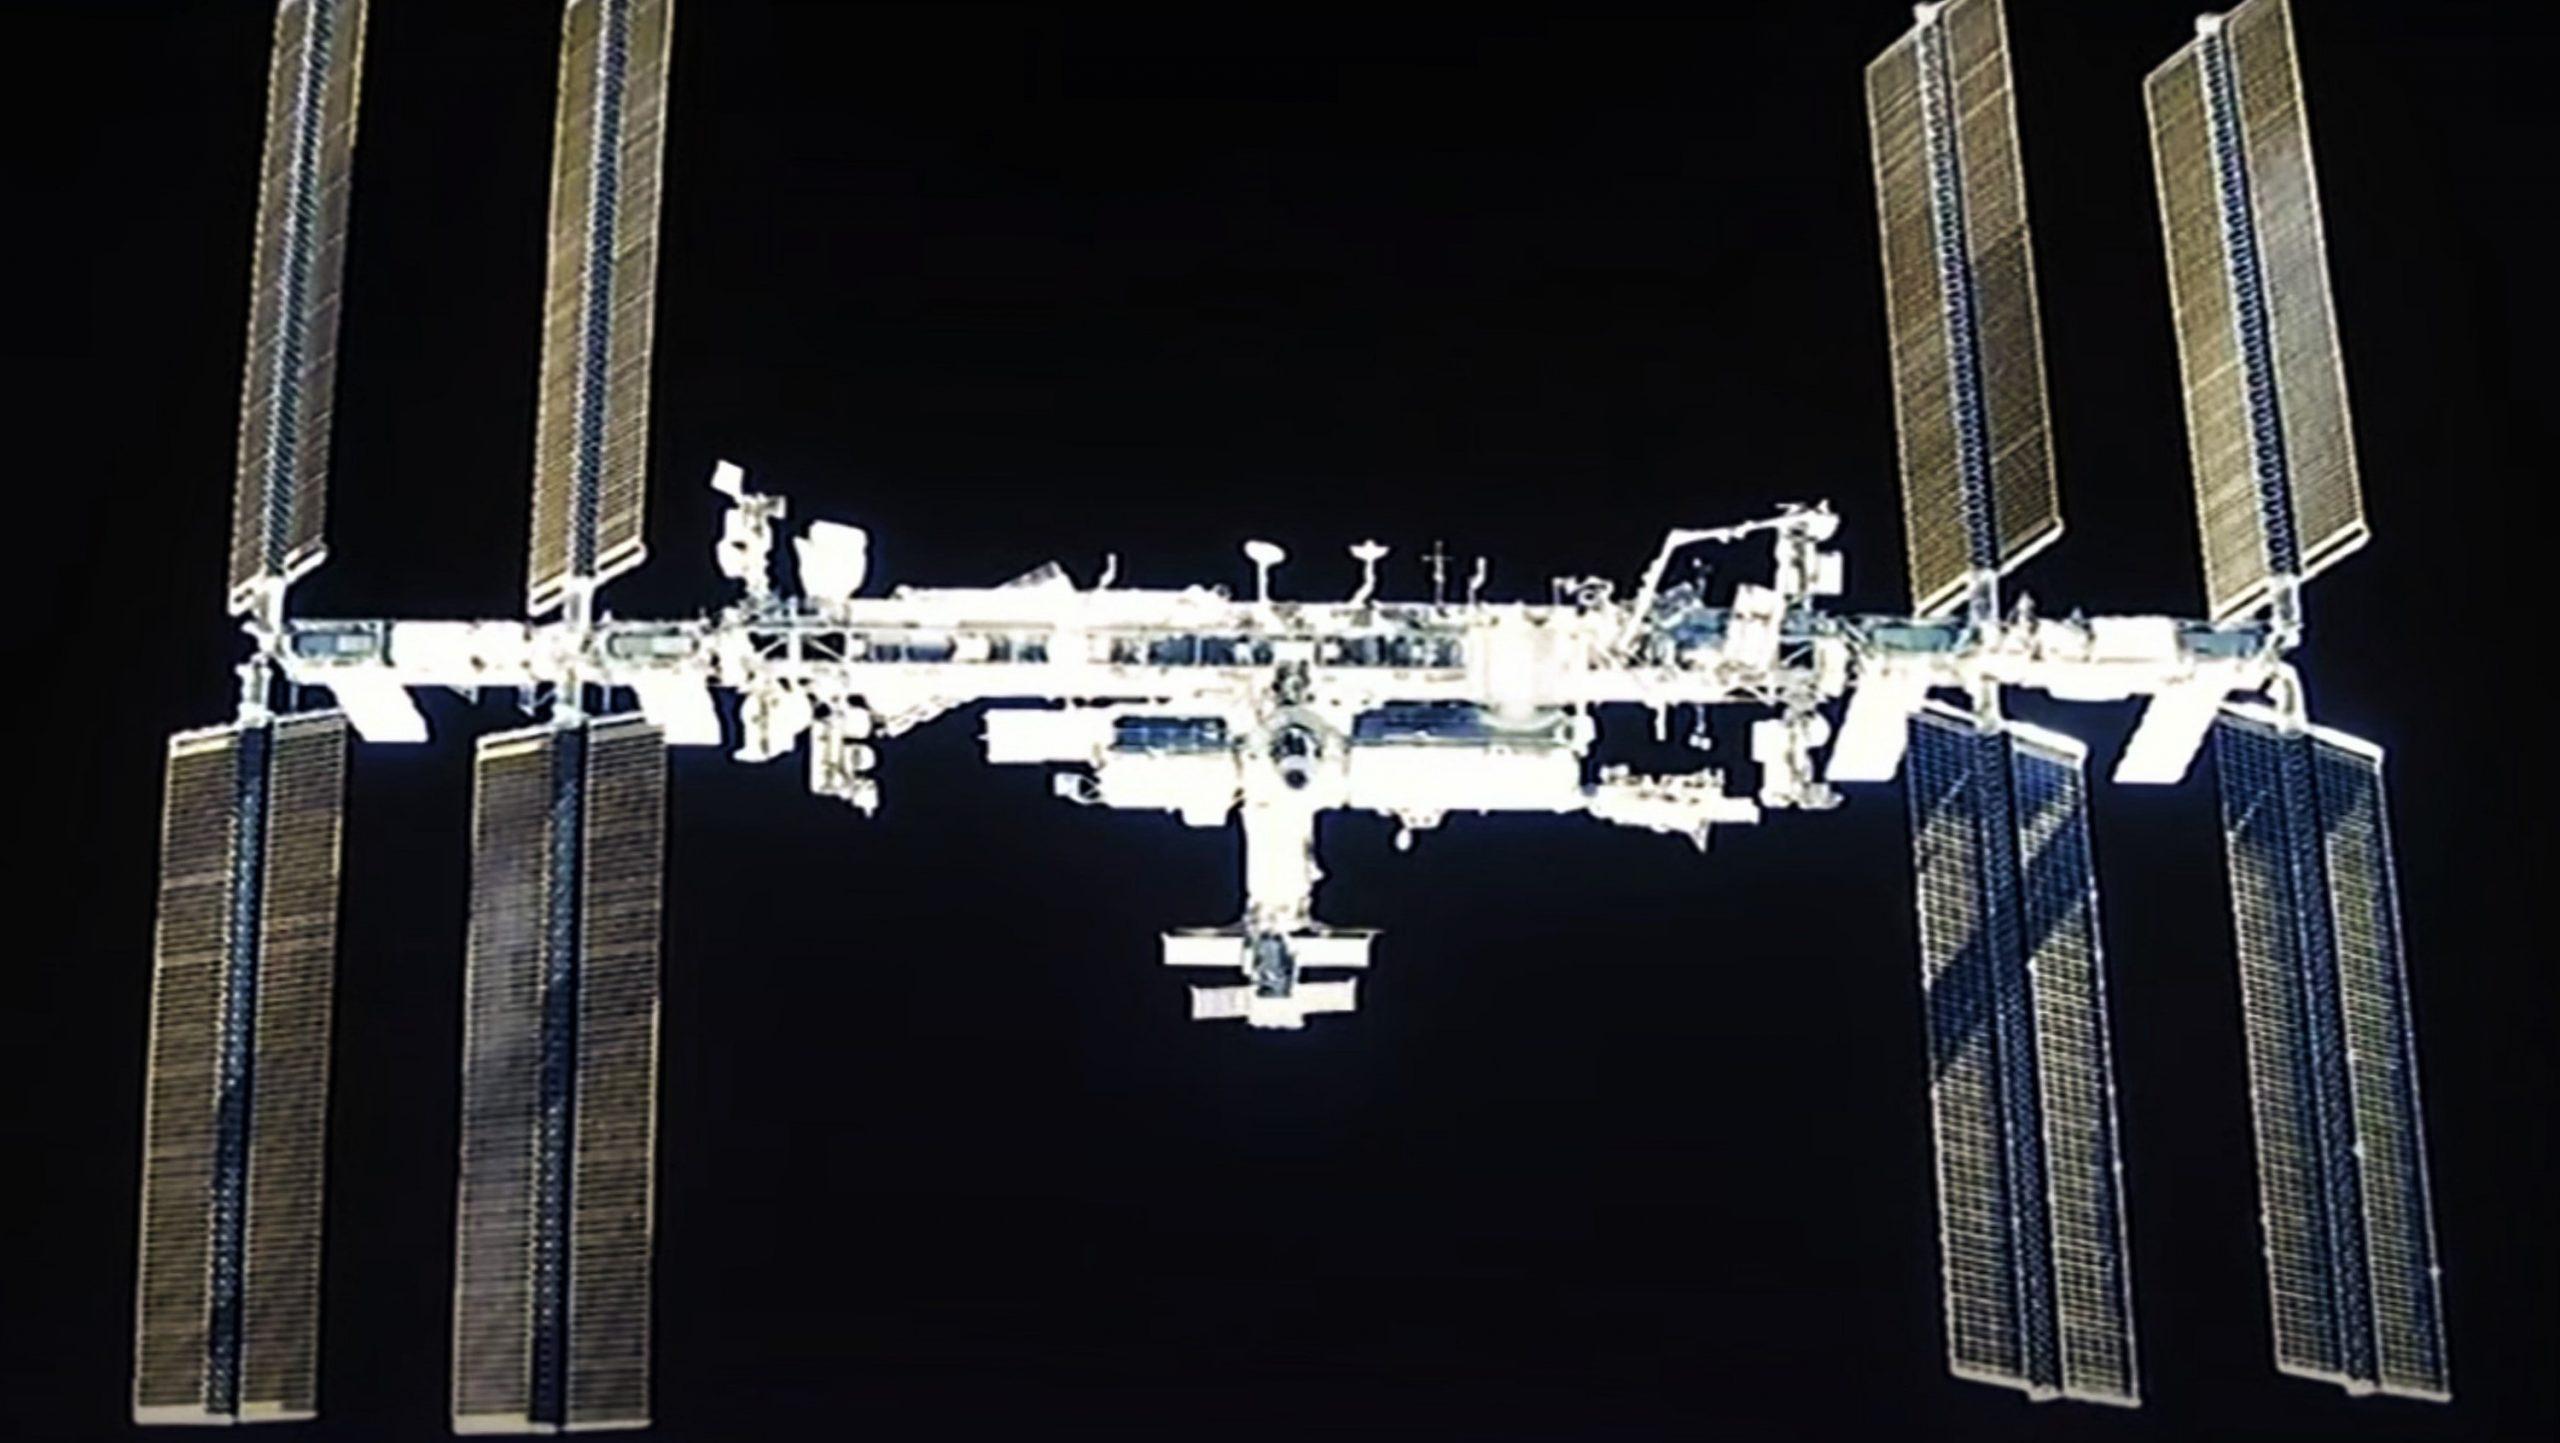 Crew-1 Crew Dragon C207 webcast 111620 (NASA) ISS view 1